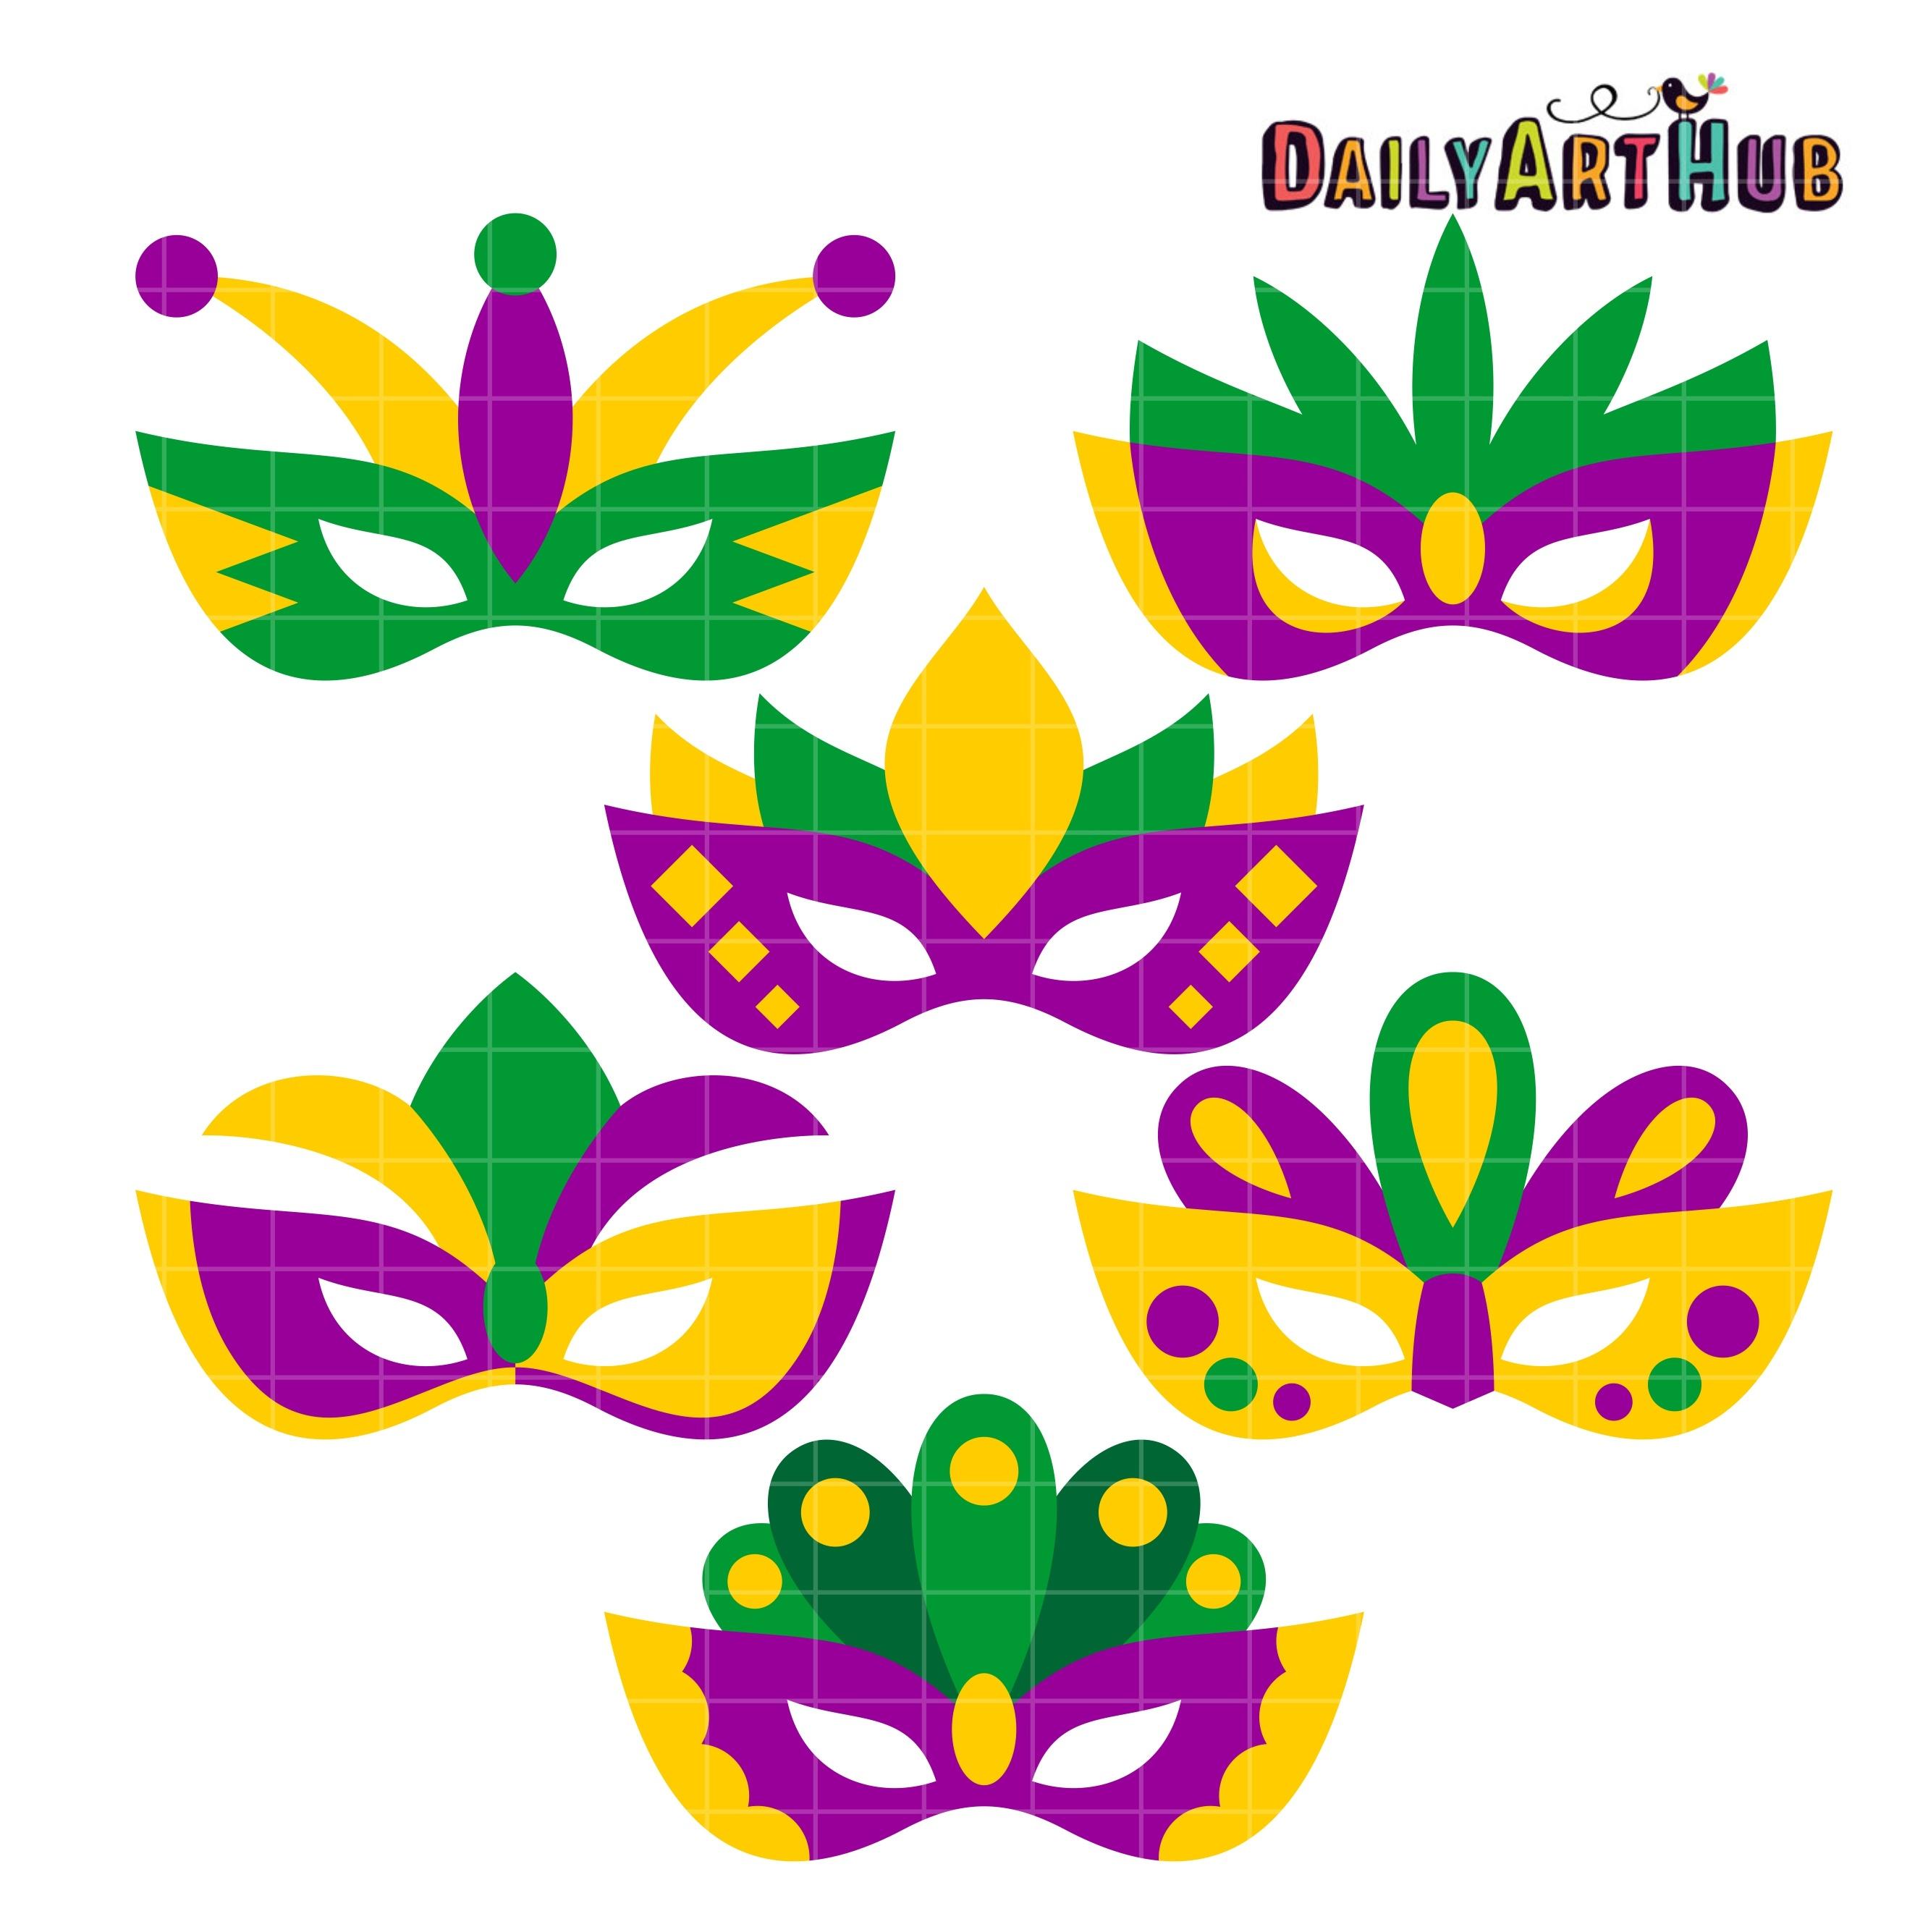 Mardi Gras Masks Clip Art Set – Daily Art Hub – Free Clip Art Everyday - Free Printable Mardi Gras Masks